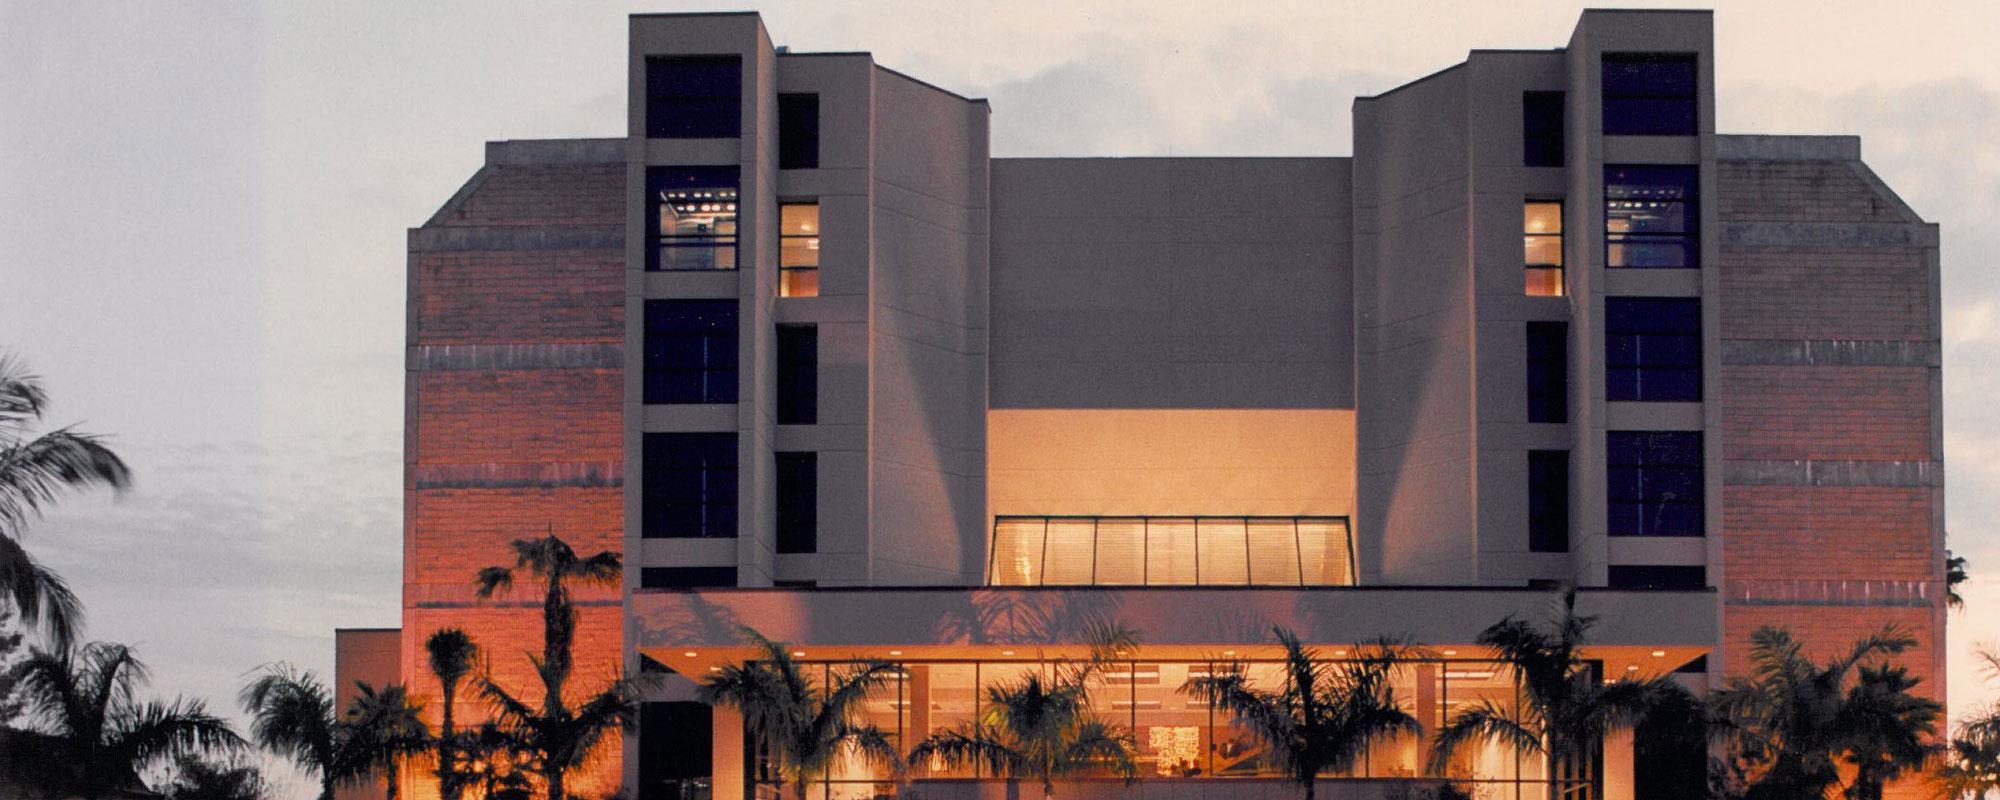 Barbara B. Mann Facade Edison State College – Ft.-Myers